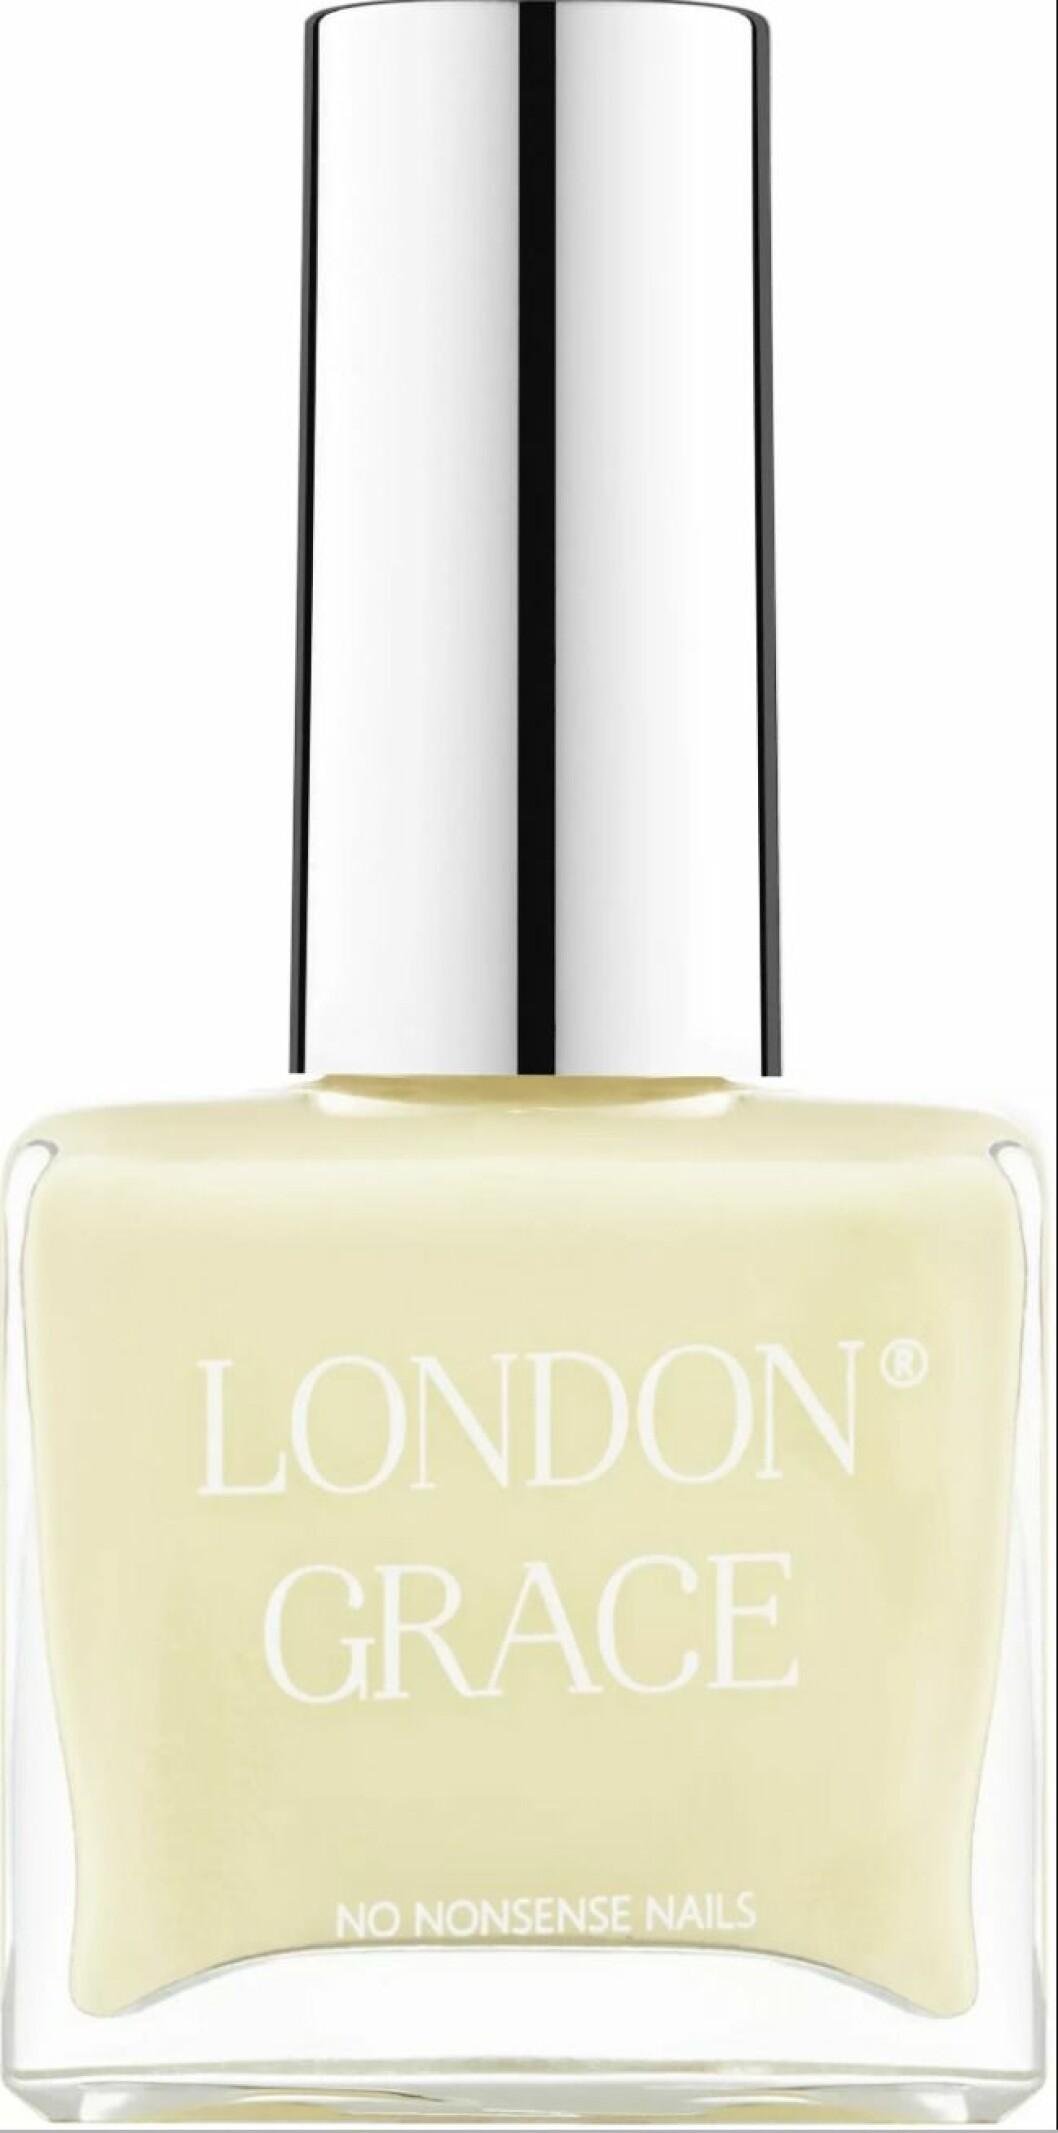 Solgult nagellack från London Grace.